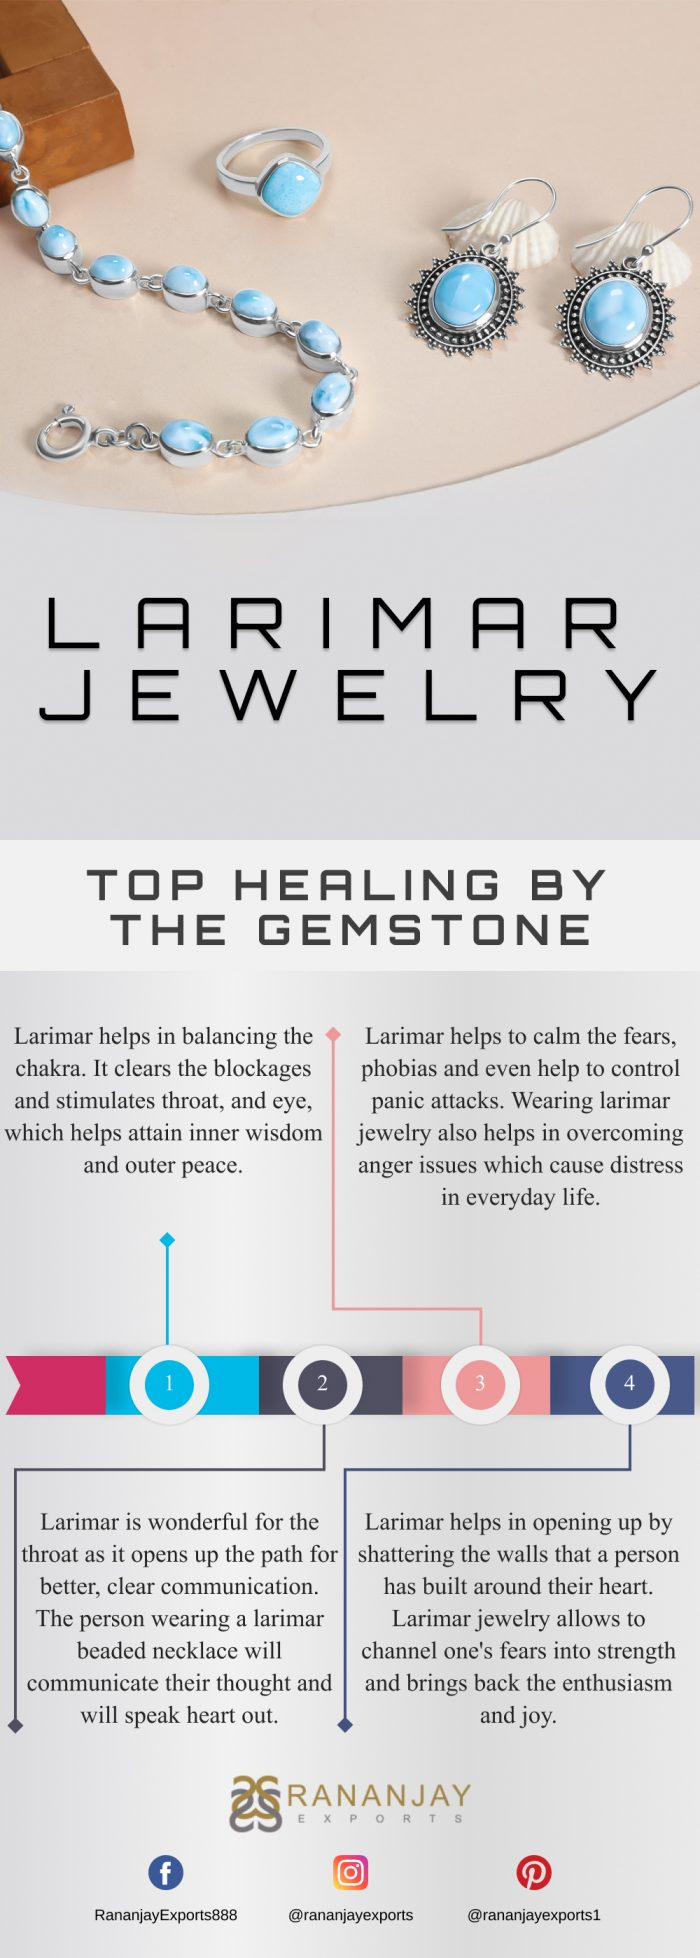 Top Healing By The Larimar Gemstone